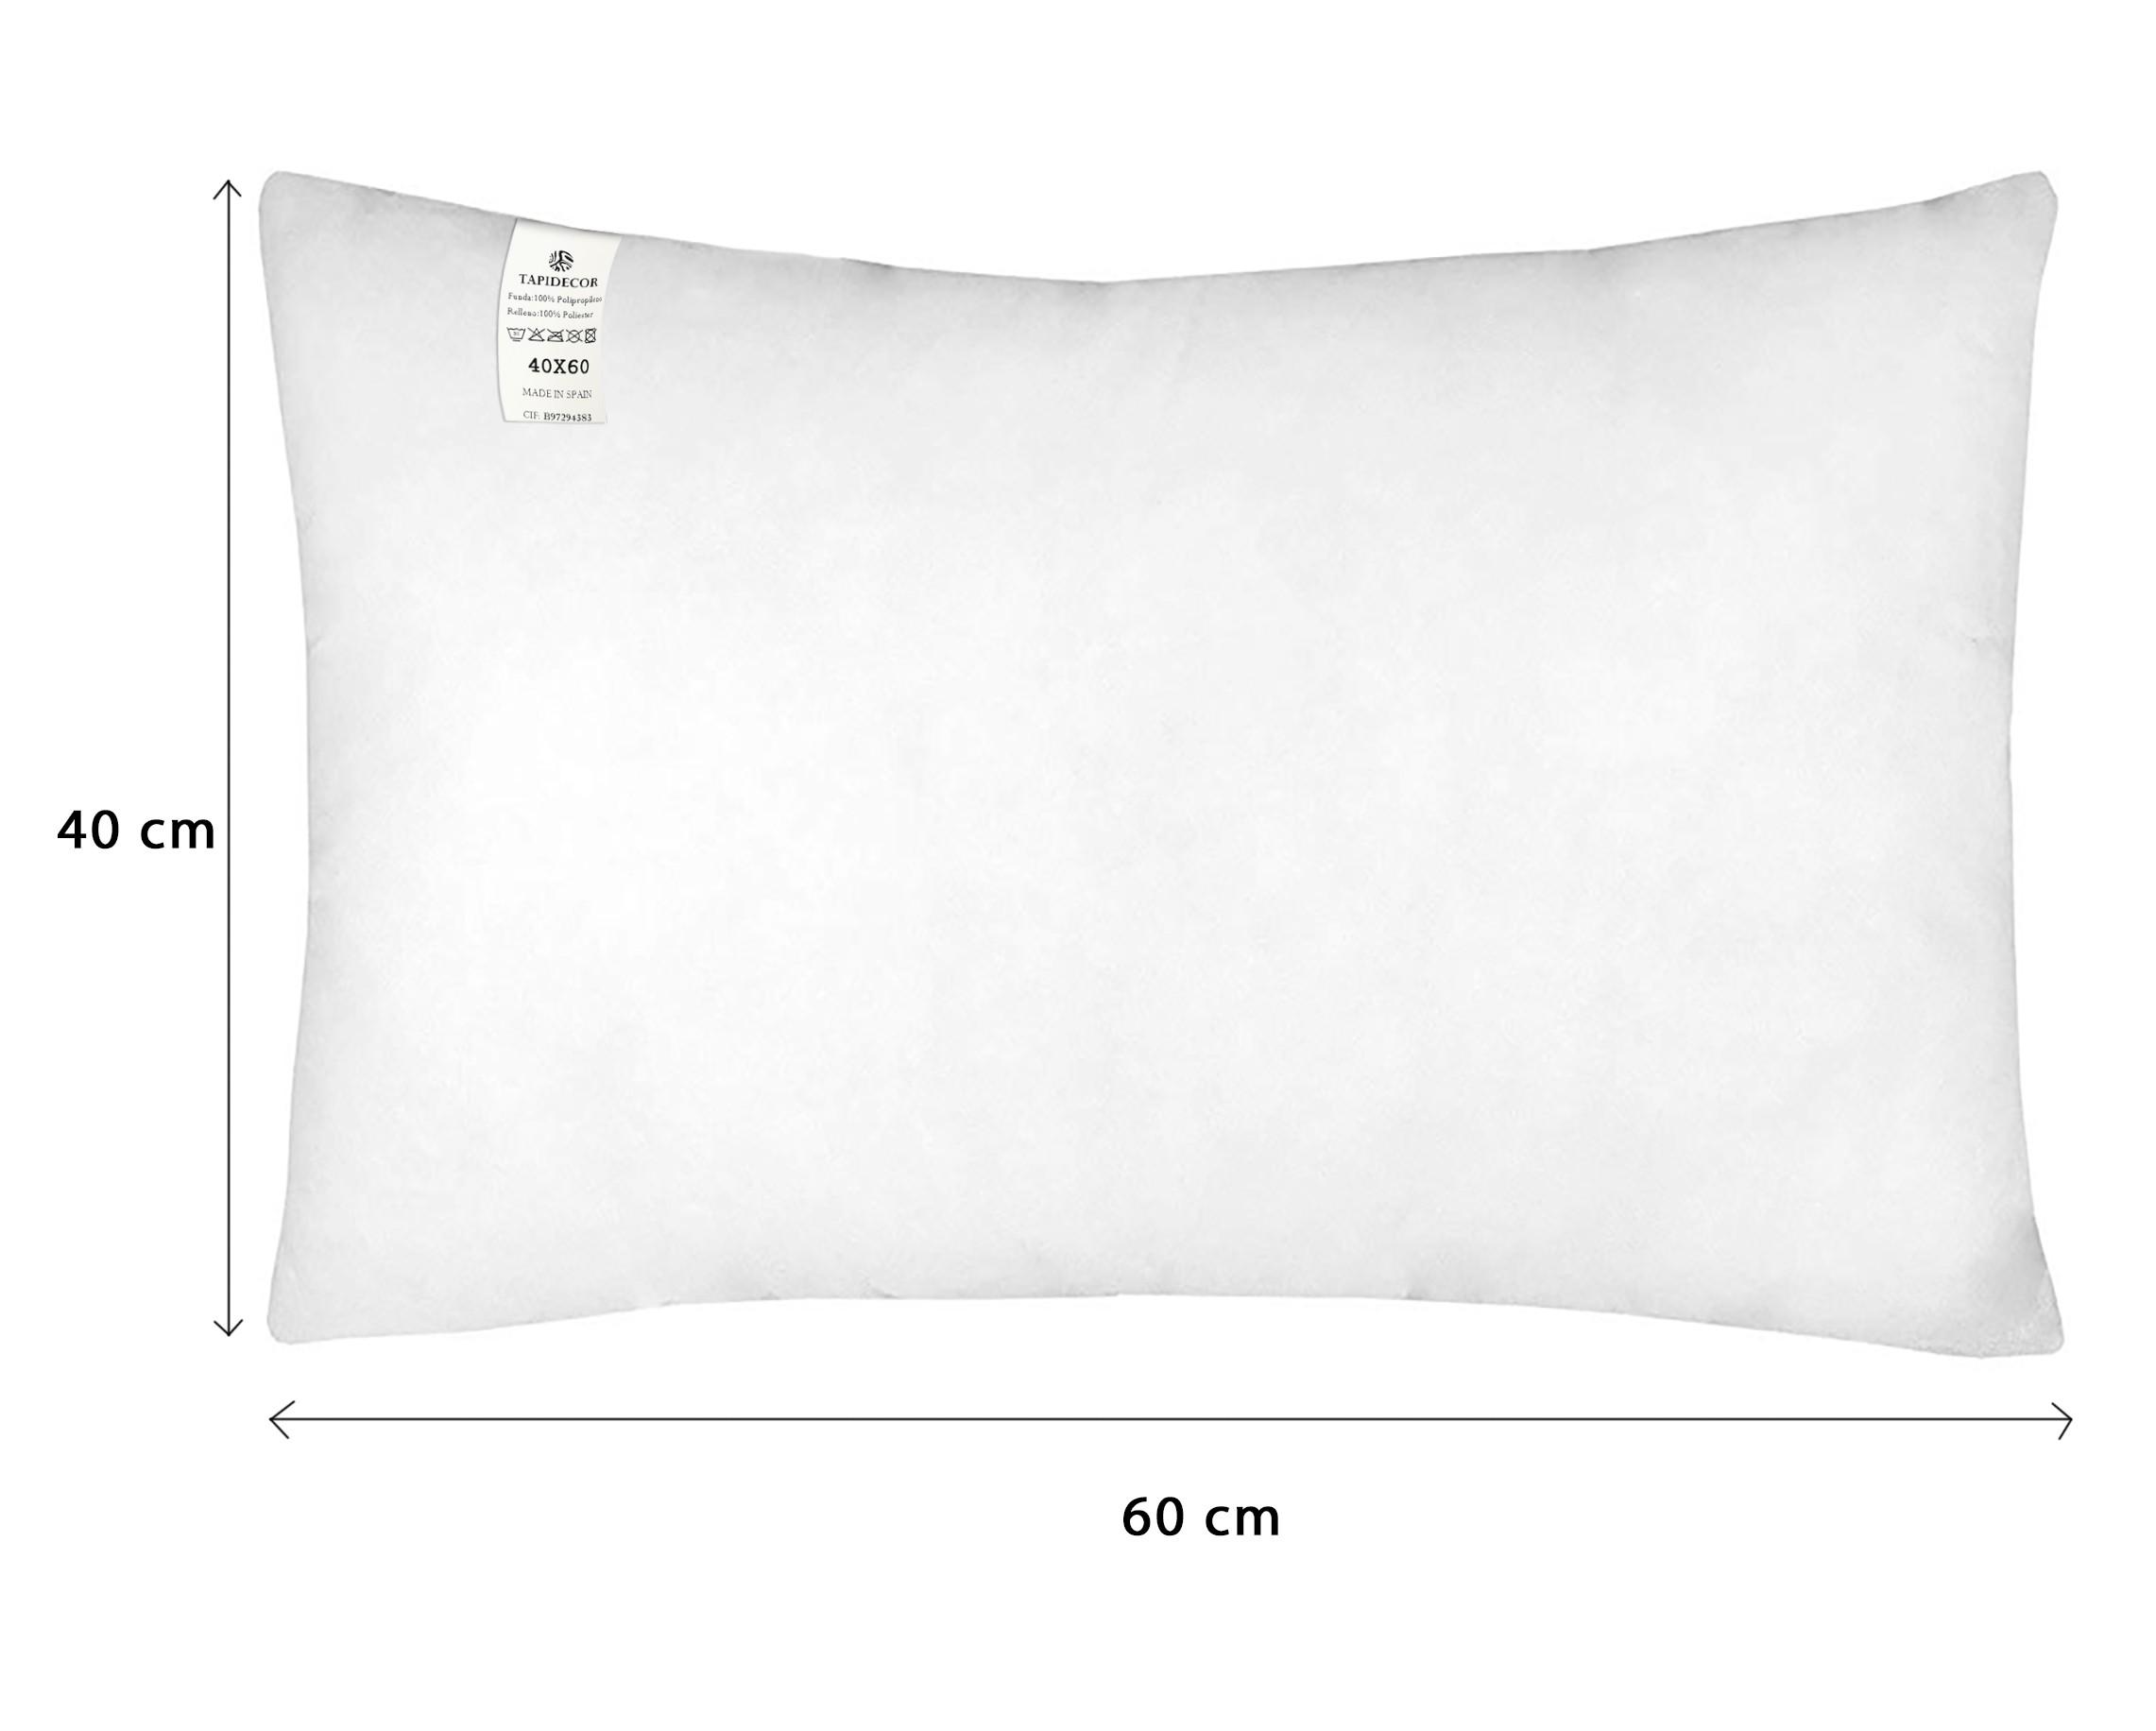 Antibacteriano y Transpirable tapidecor Relleno de Coj/ín Fibra 100/% Poli/éster Reciclado - 35 X 35 Fibra